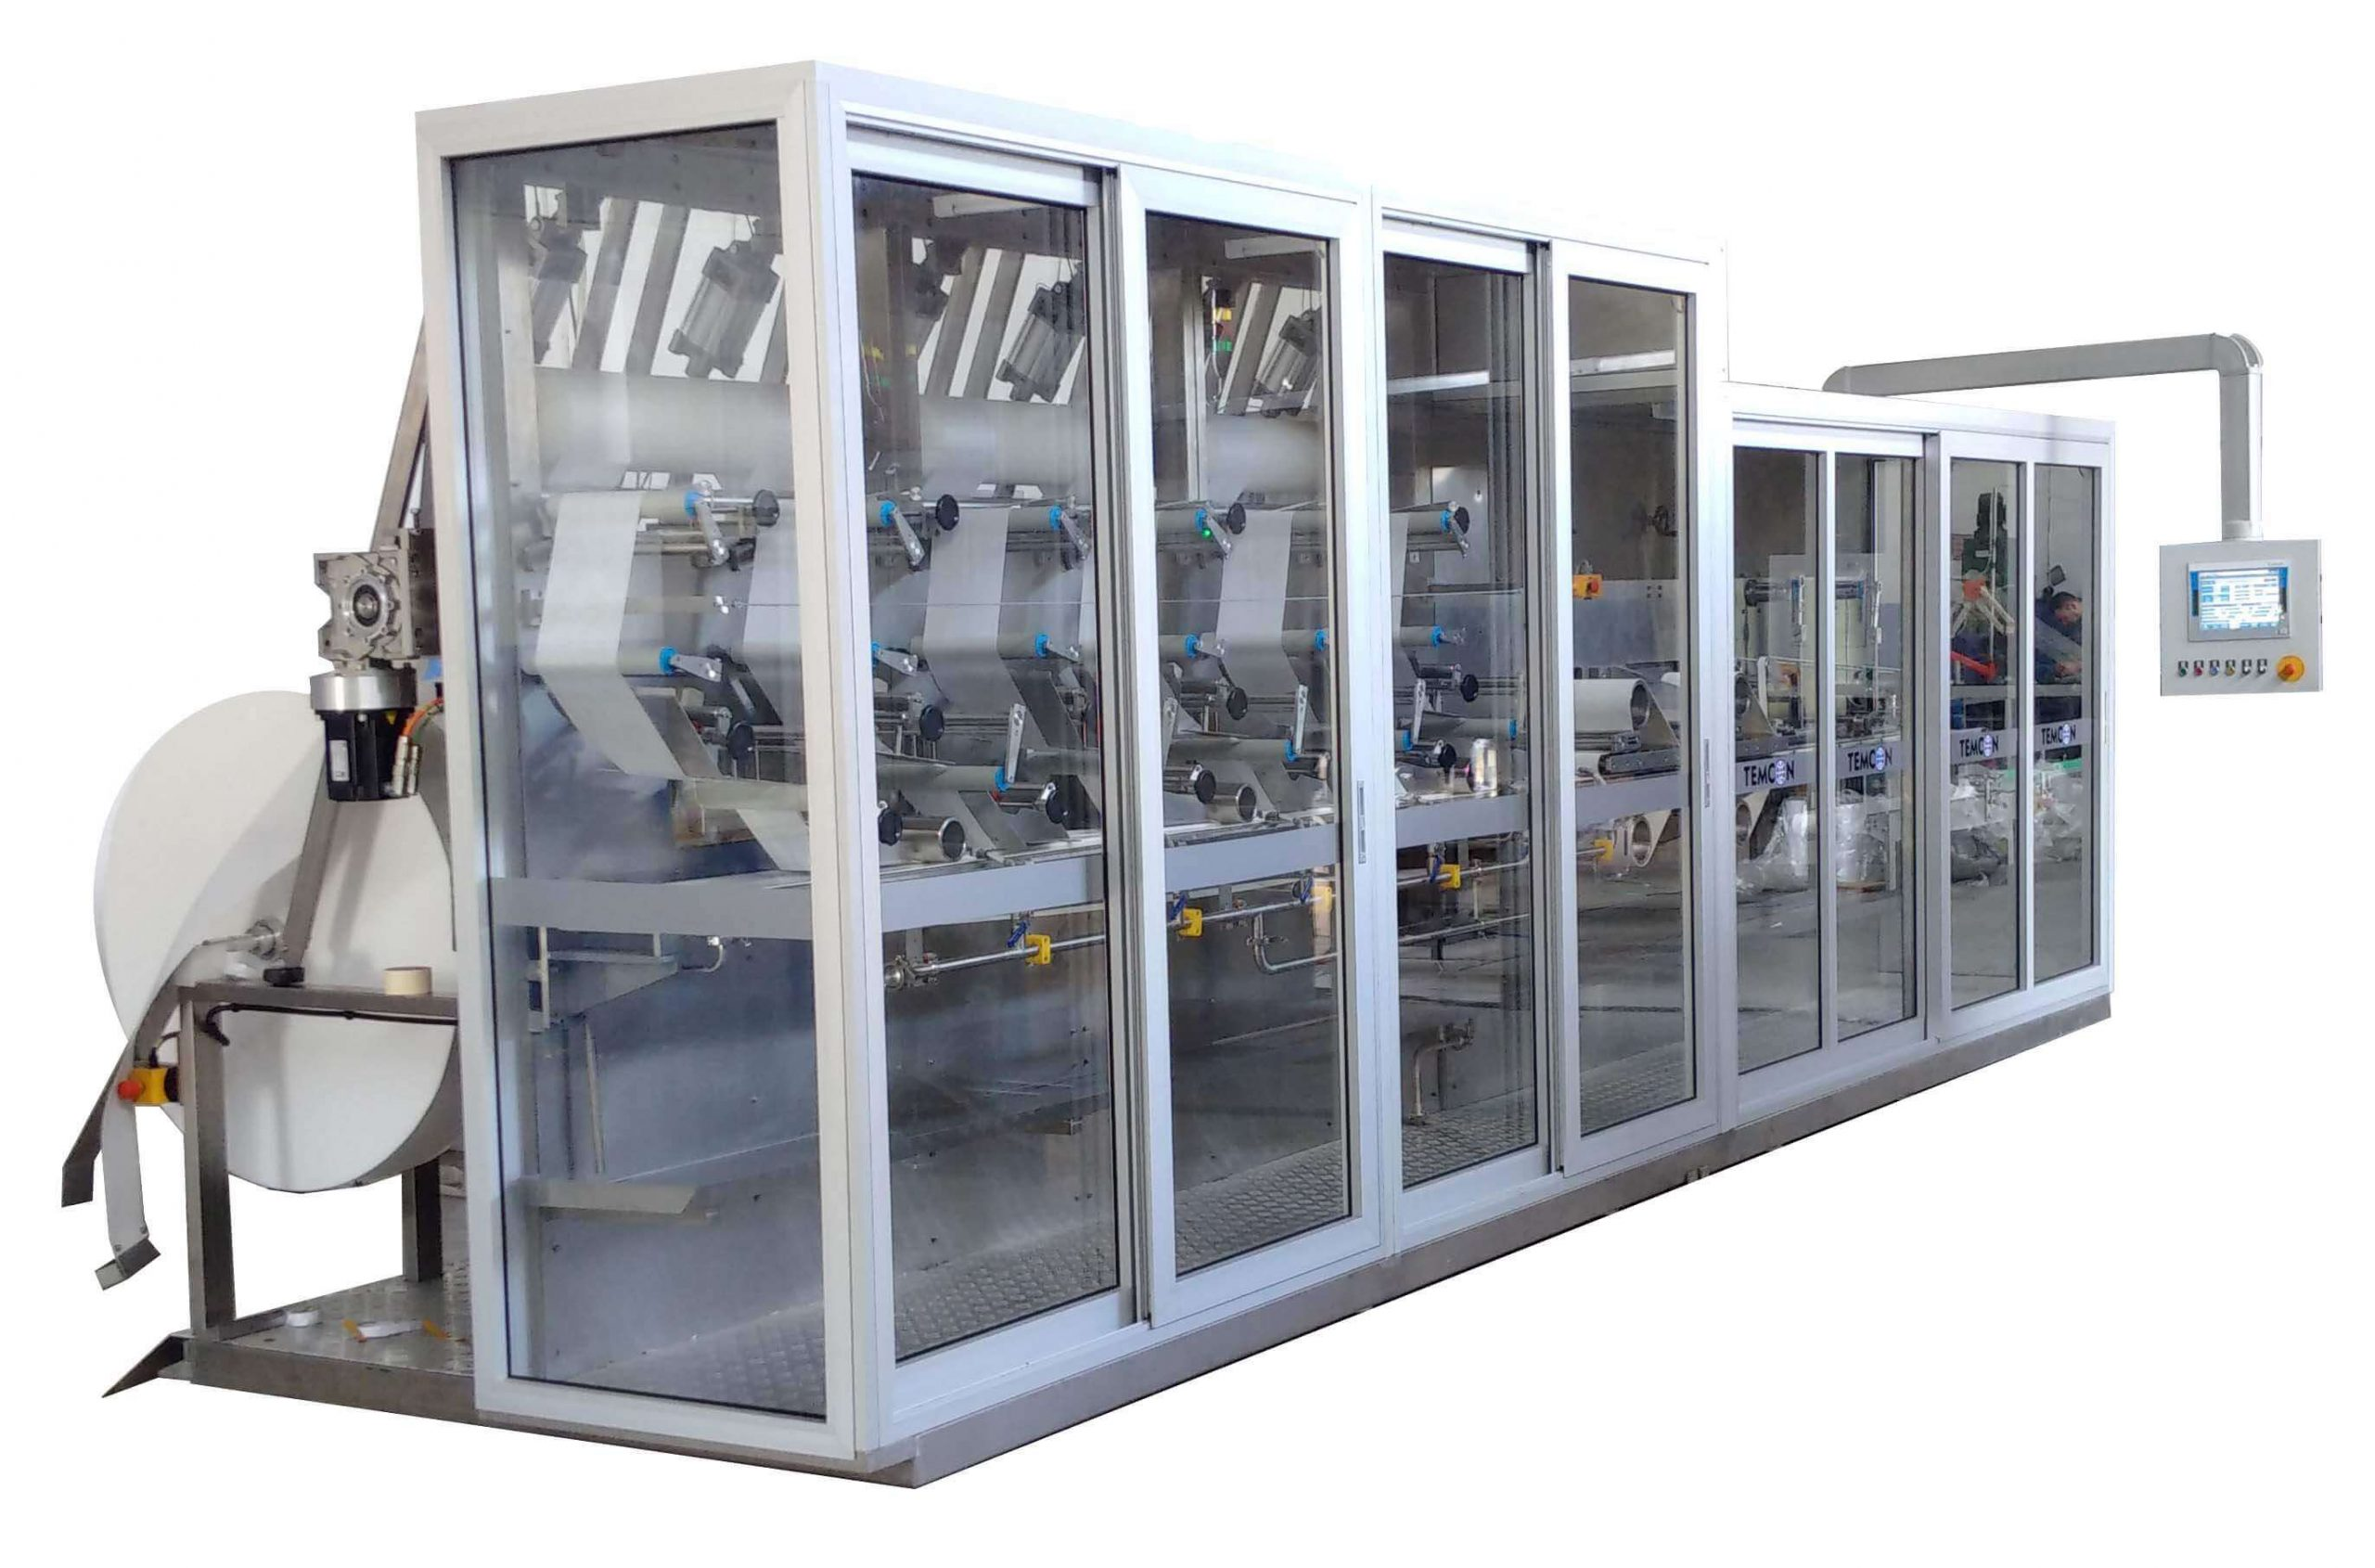 AUTOMATIC WET WIPES MACHINE TFL3600